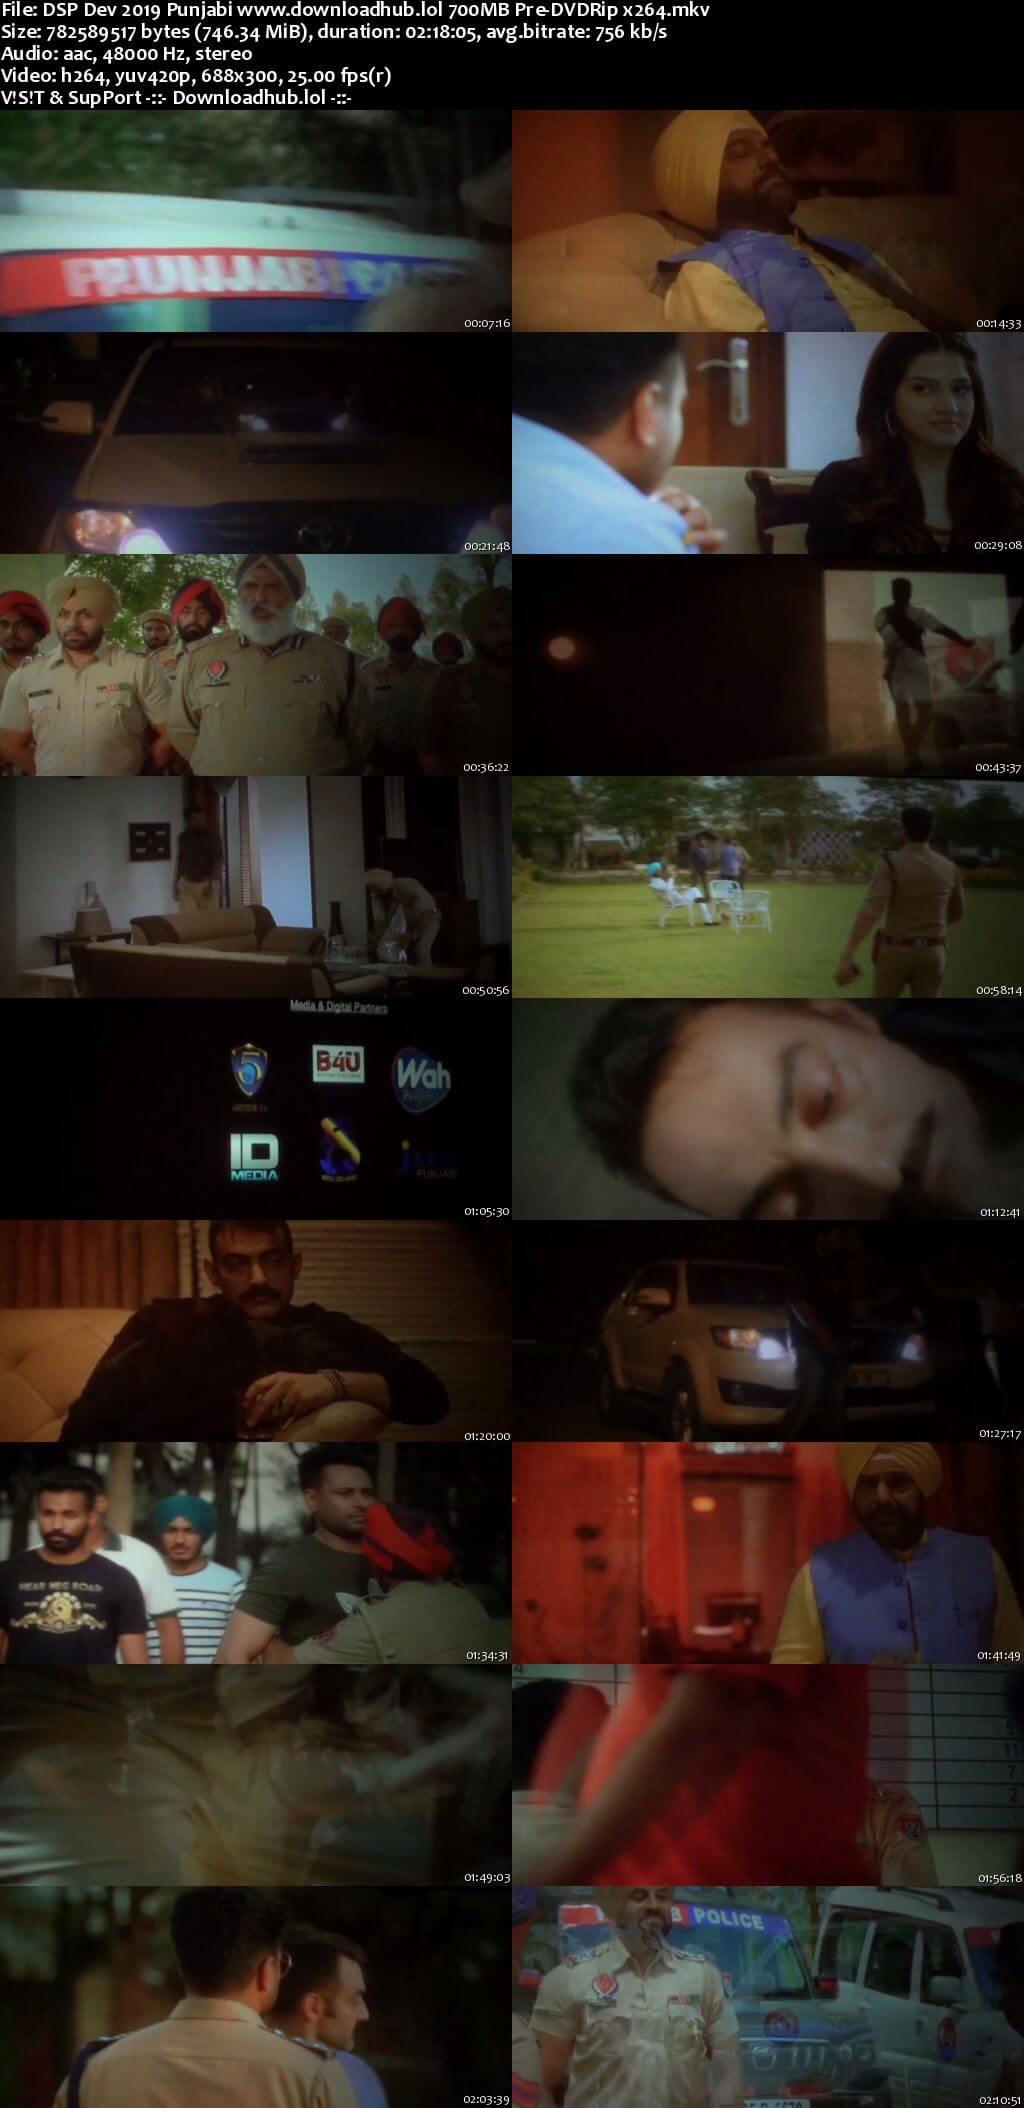 DSP Dev 2019 Punjabi 700MB Pre-DVDRip x264